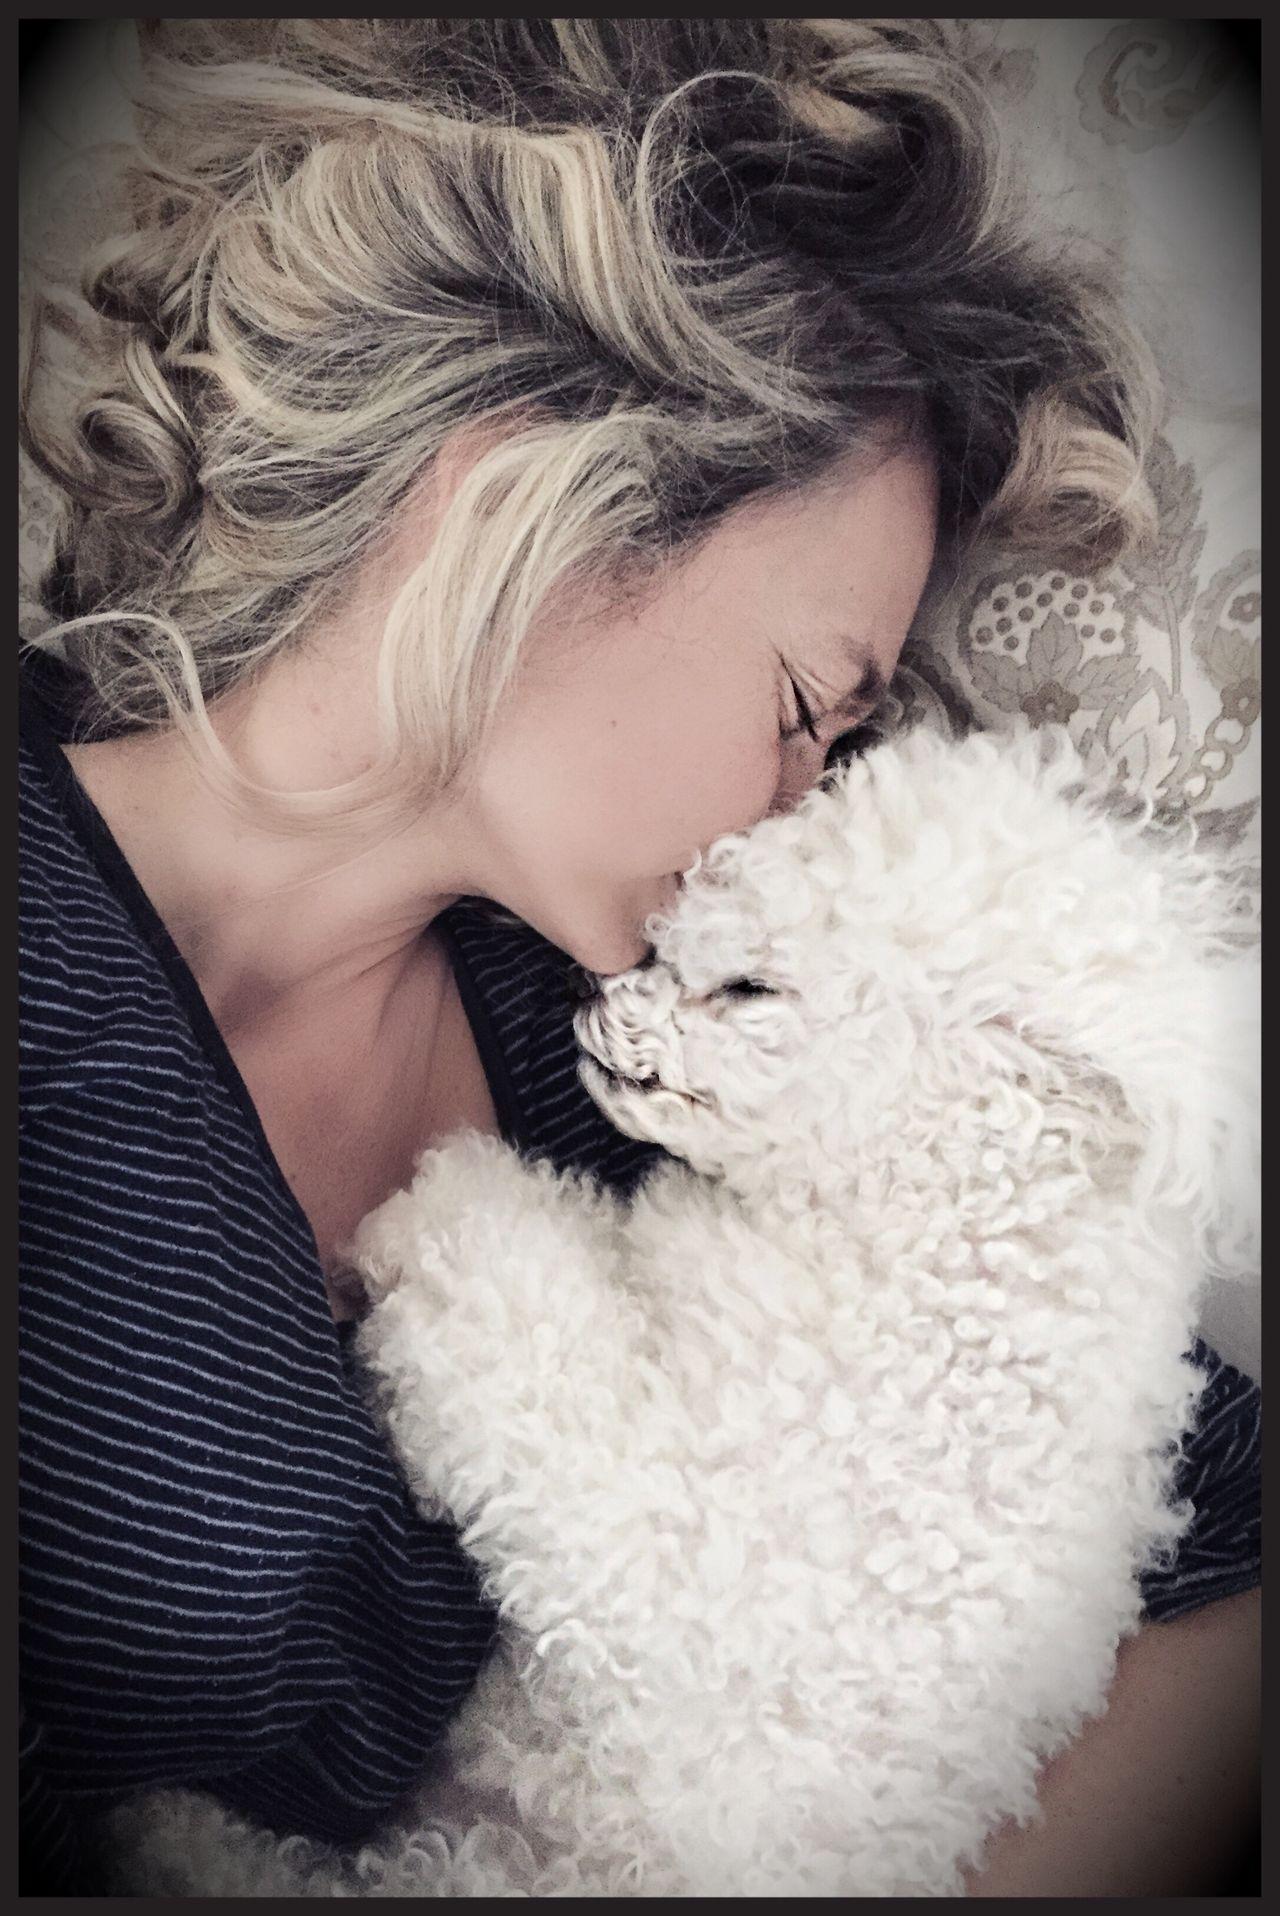 Lifestyles Leisure Activity Fur Pets Poodle Poodletoy Women Sleeping Sleeping Dog Togetherness Loyalty Hug